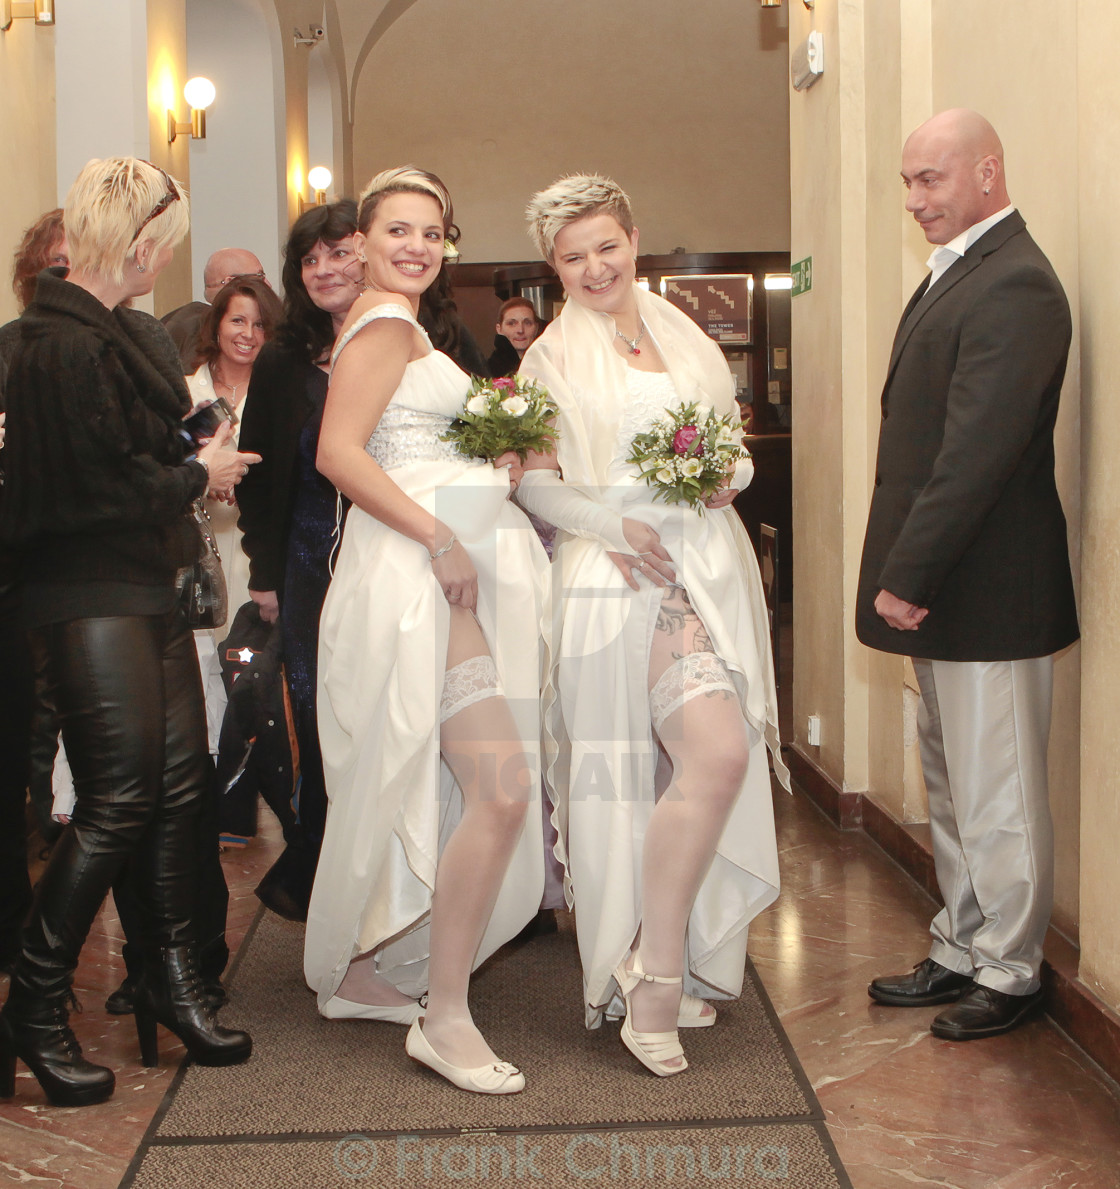 Lesbian Getting Married 110